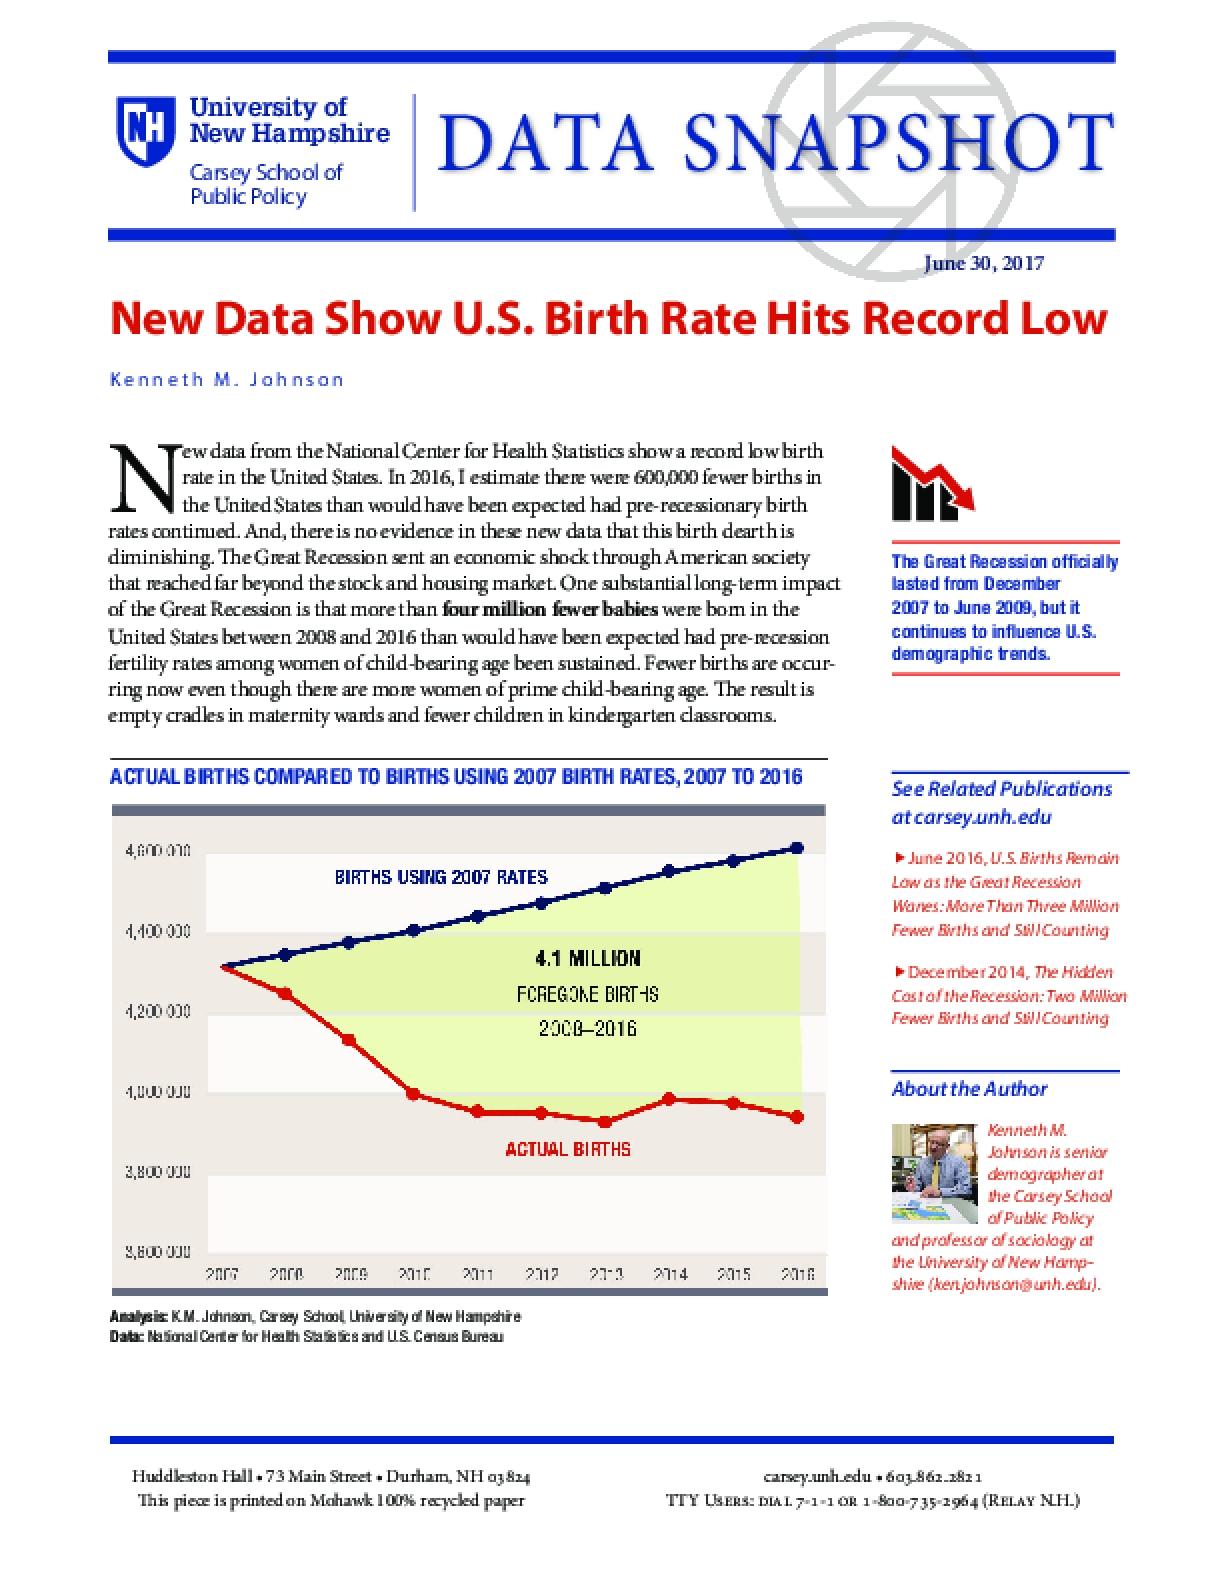 Data Snapshot: New Data Show U.S. Birth Rate Hits Record Low